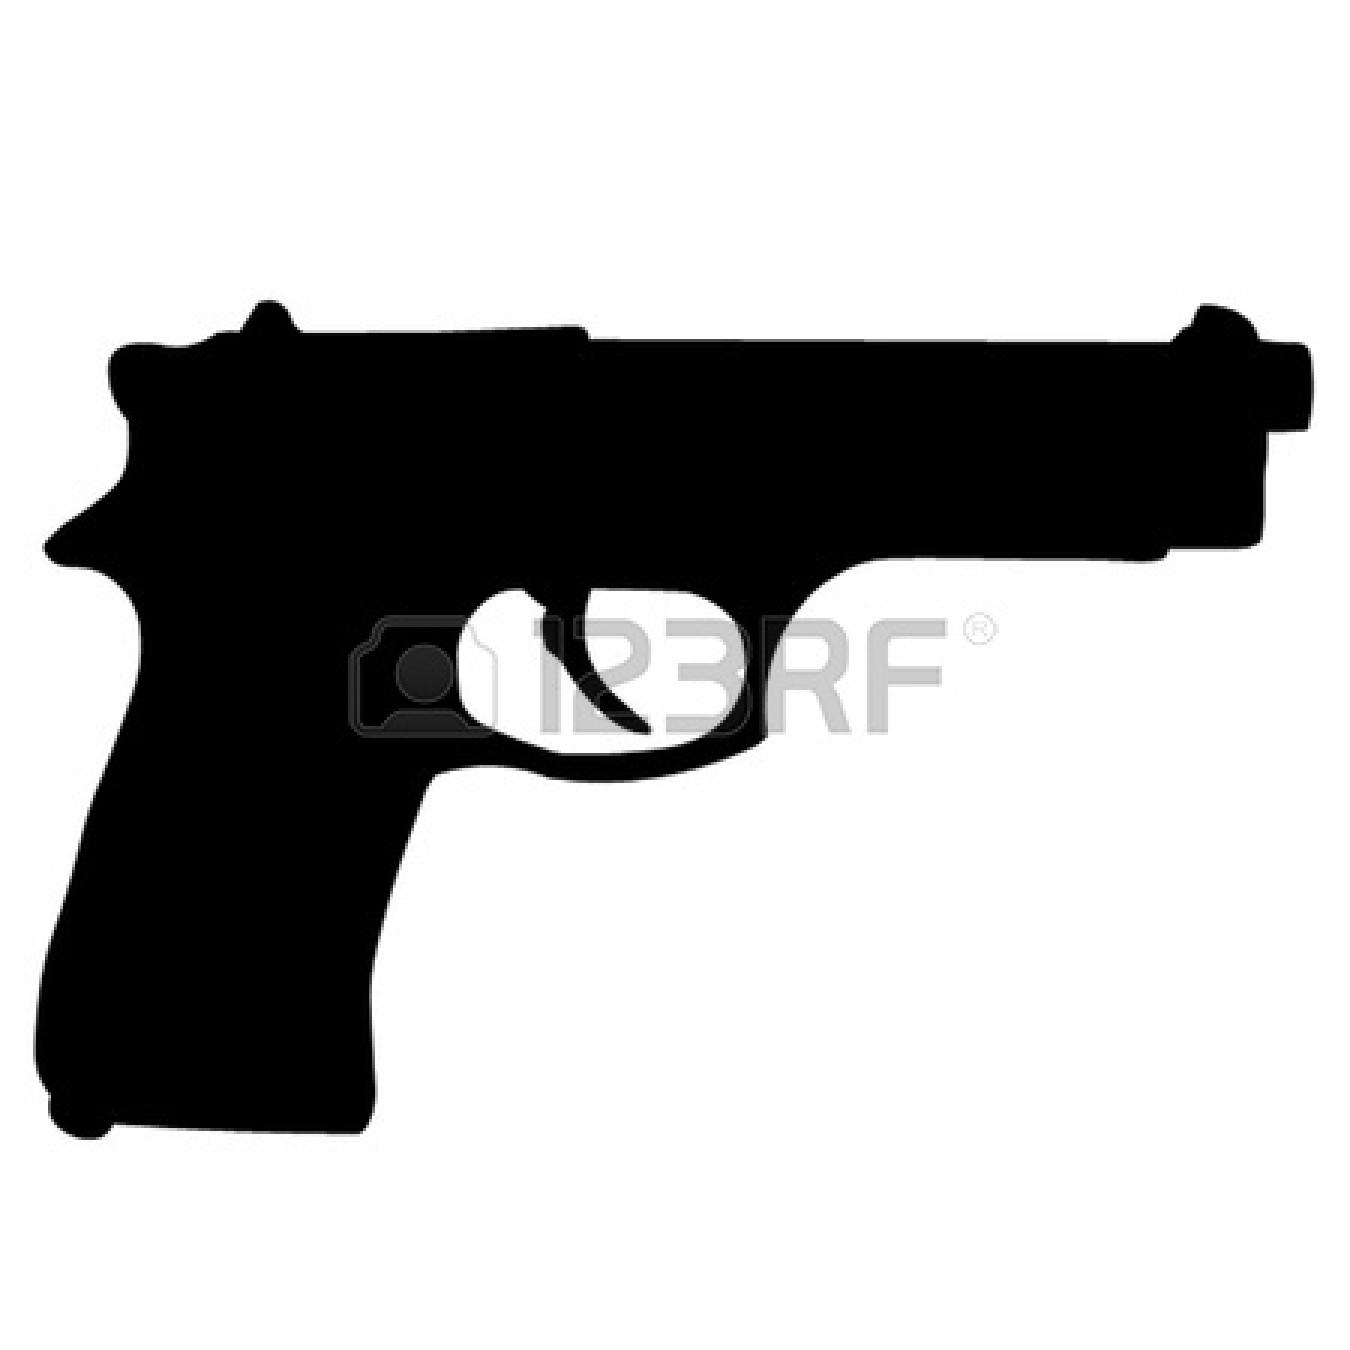 Gun clipart images.